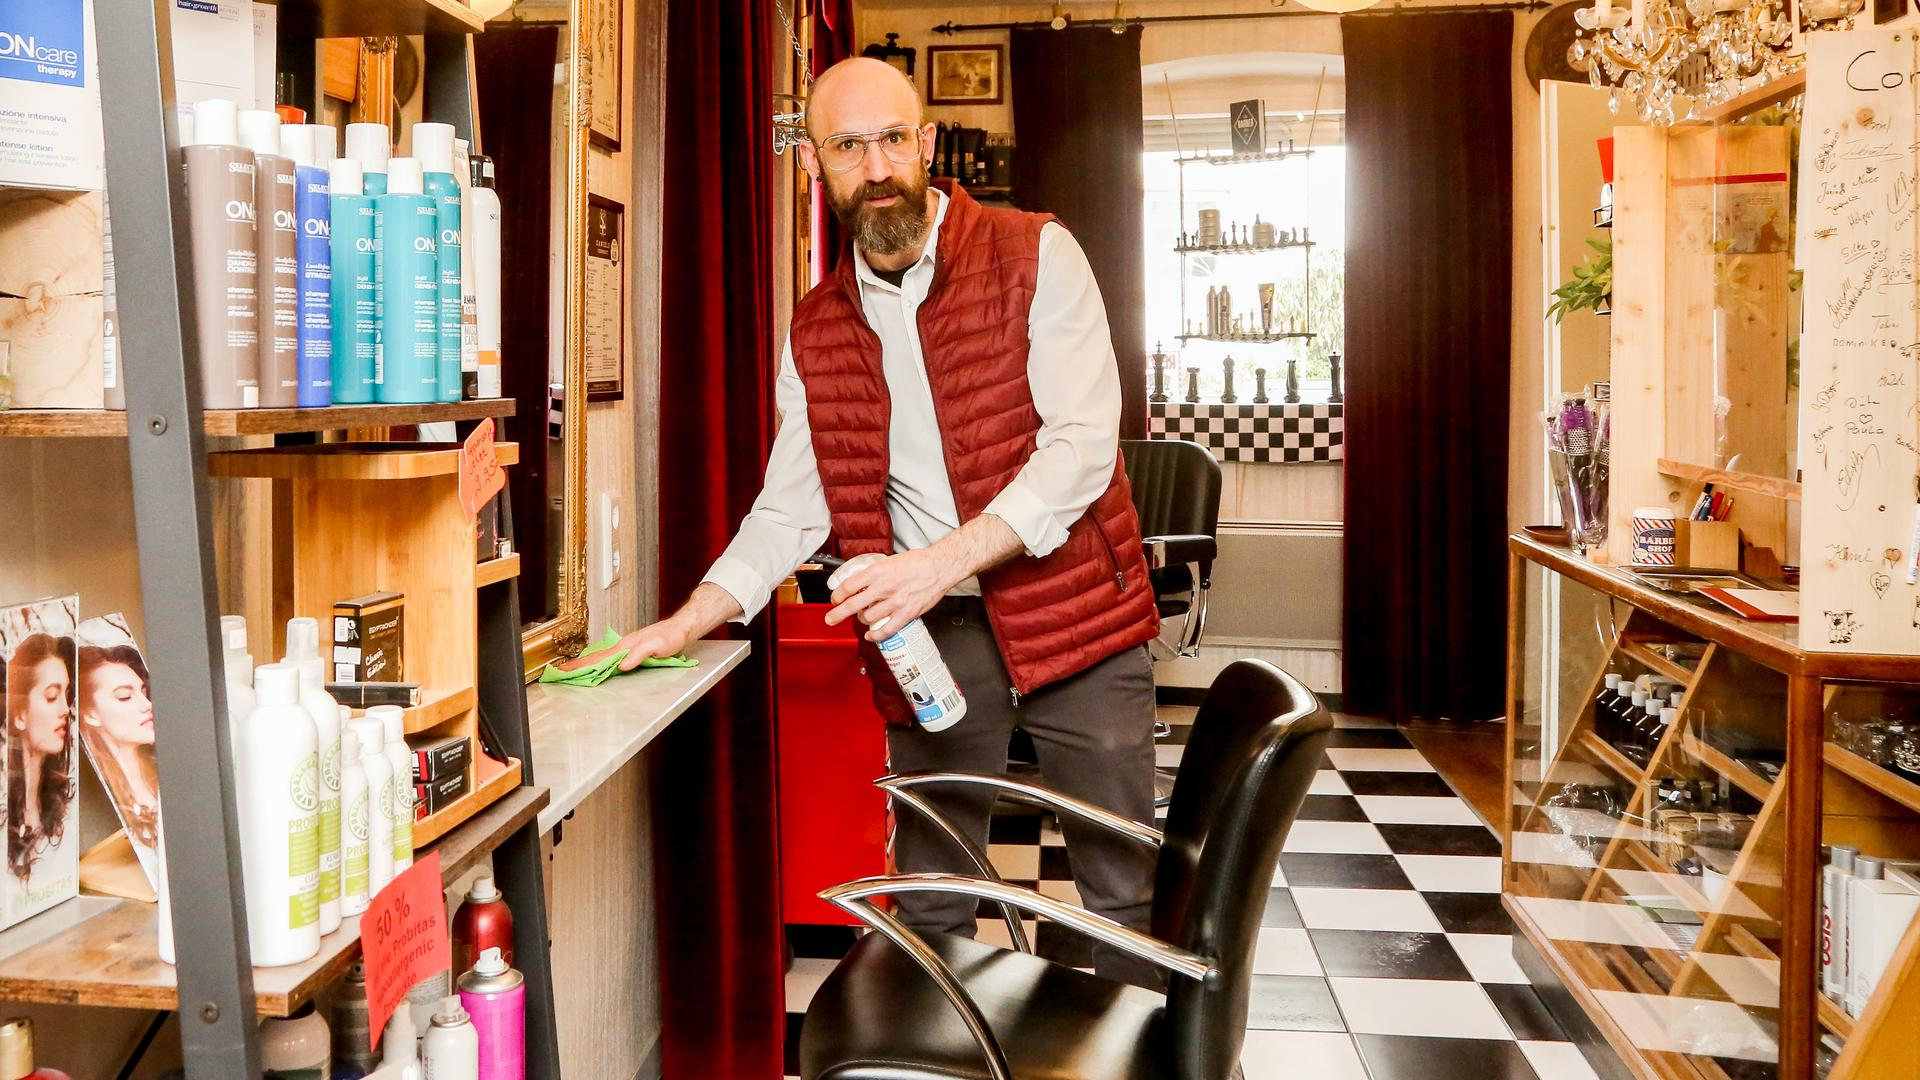 Daniel Simmel desinfiziert die Sitzplätze in seinem Friseursalon in Bretten